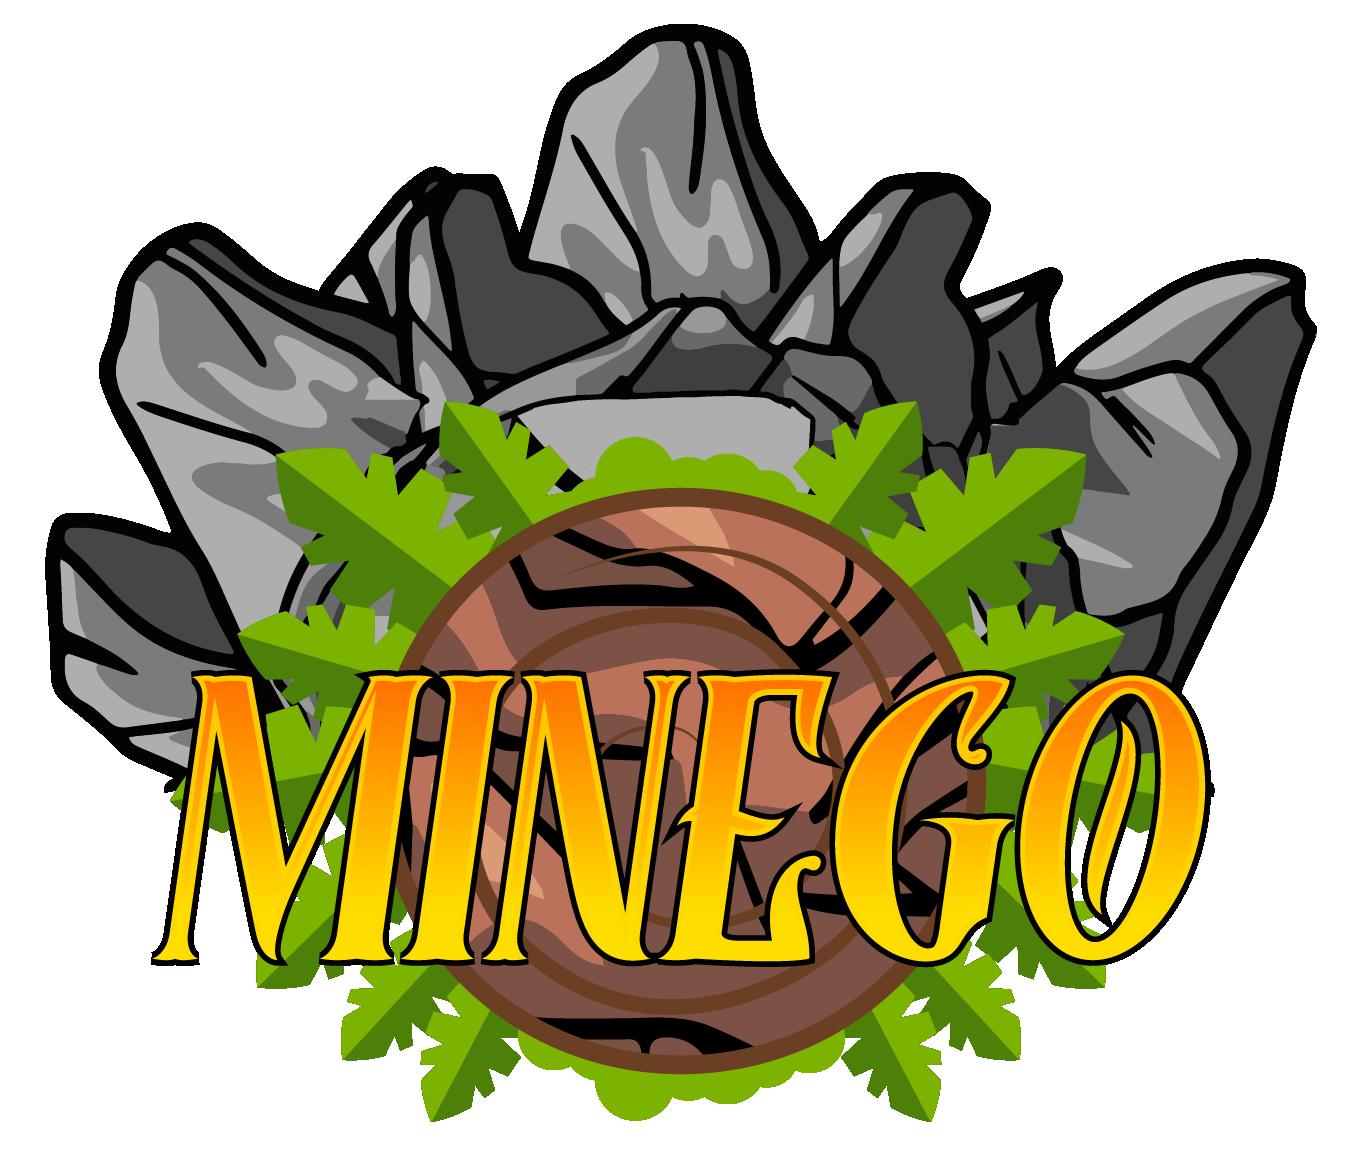 LOGO-MINEGOHD.png